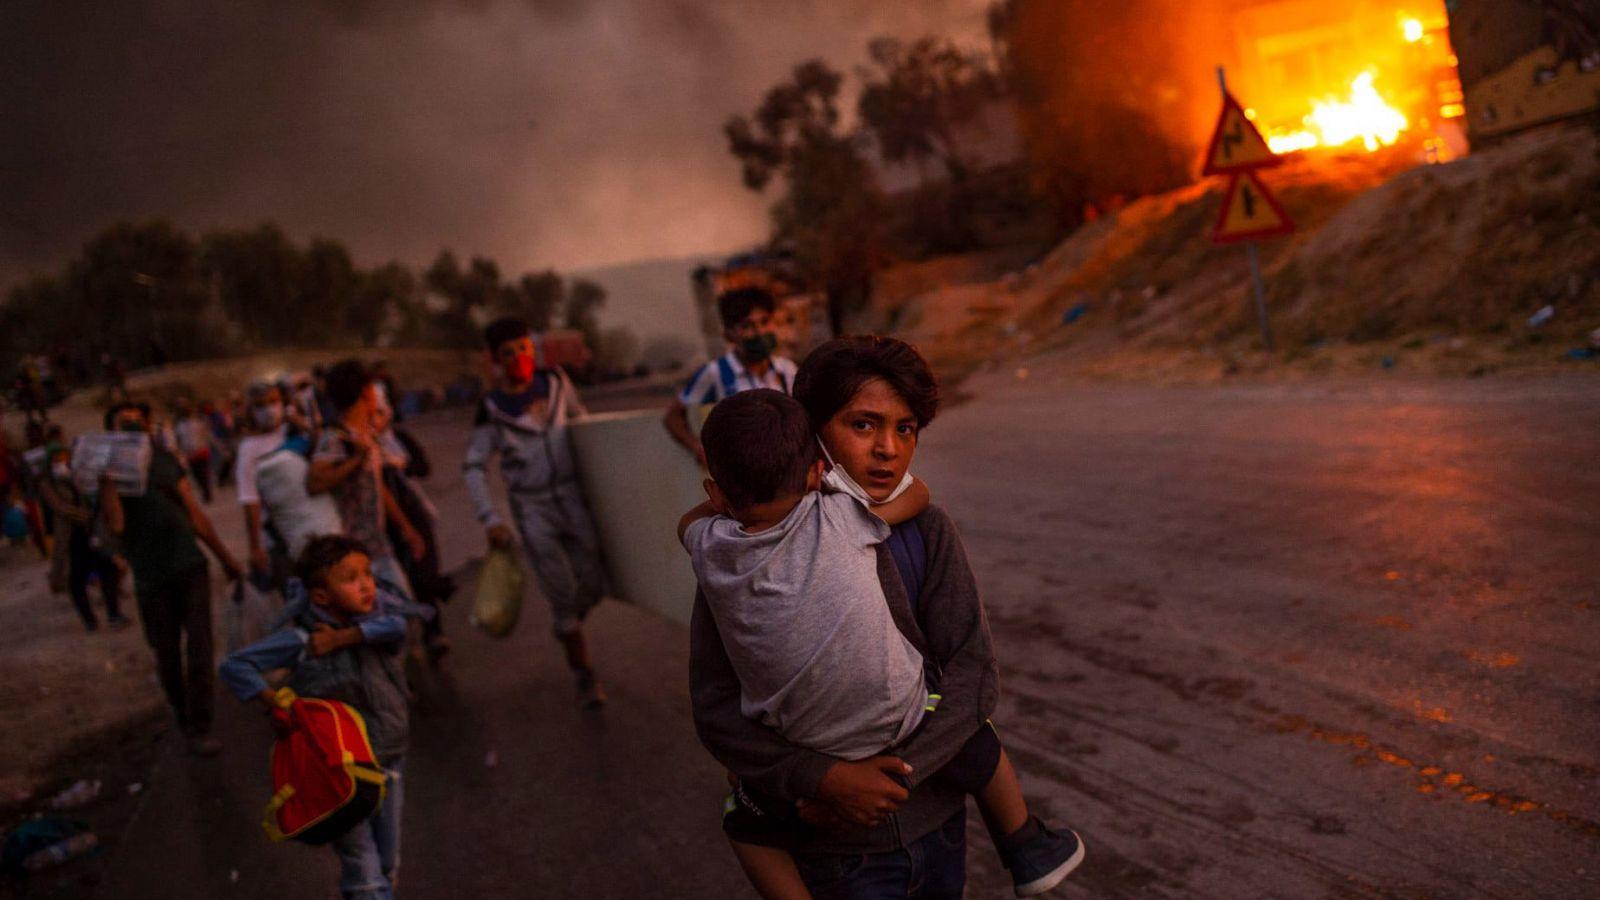 UNICEF – Φωτογραφία της χρονιάς: Η φλεγόμενη Μόρια του Έλληνα φωτογράφου Άγγελου Τζωρτζίνη [pic]